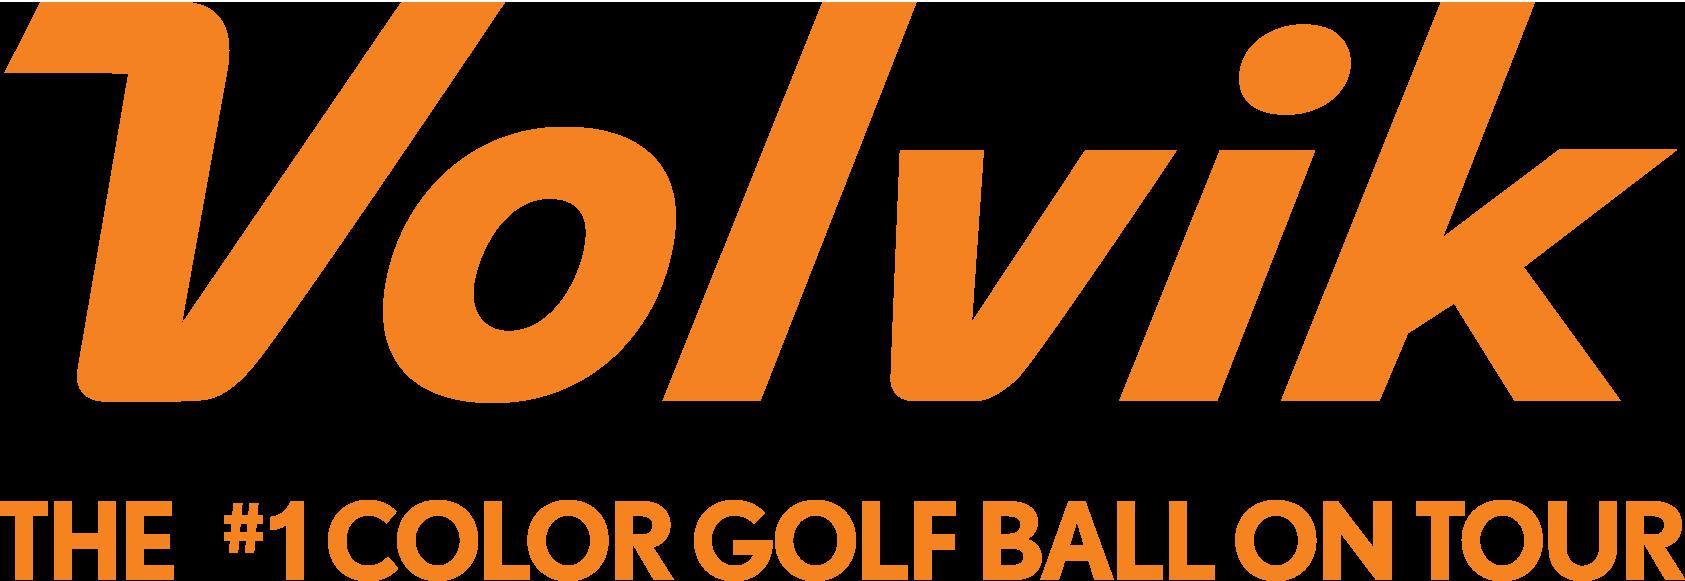 golf-ball-Volvik-logo[1].png